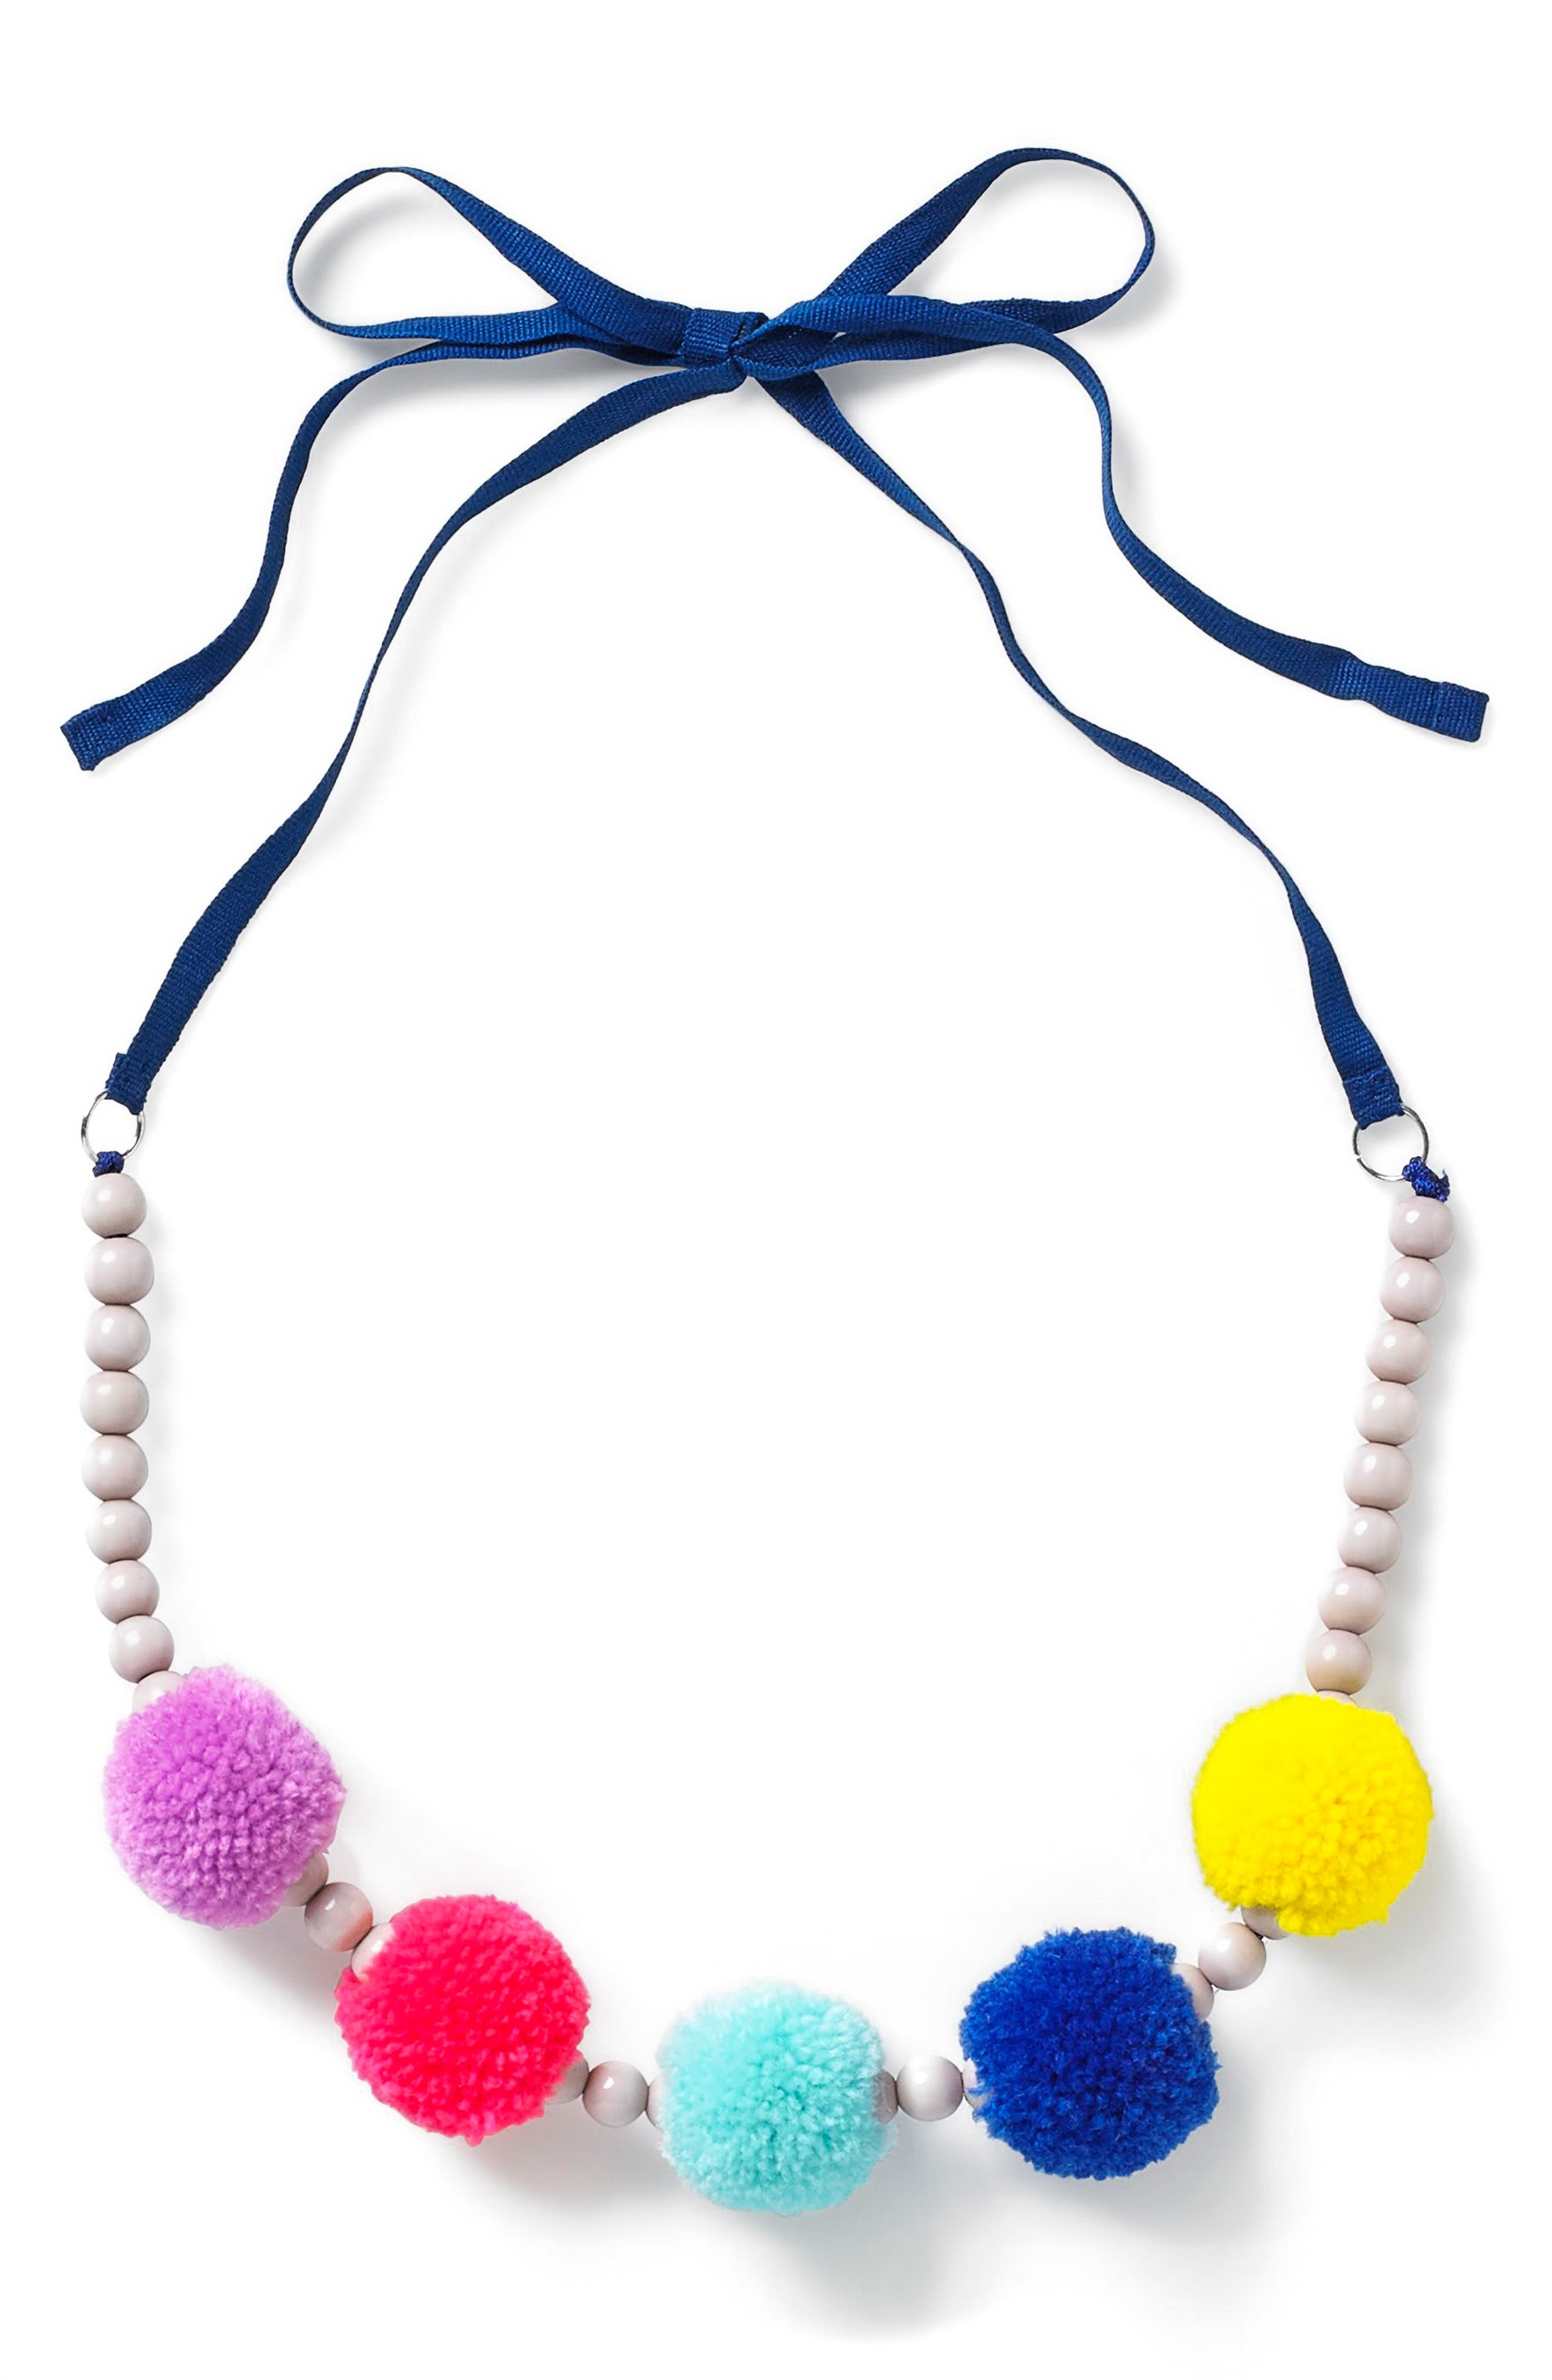 Tie Back Necklace,                             Main thumbnail 1, color,                             400